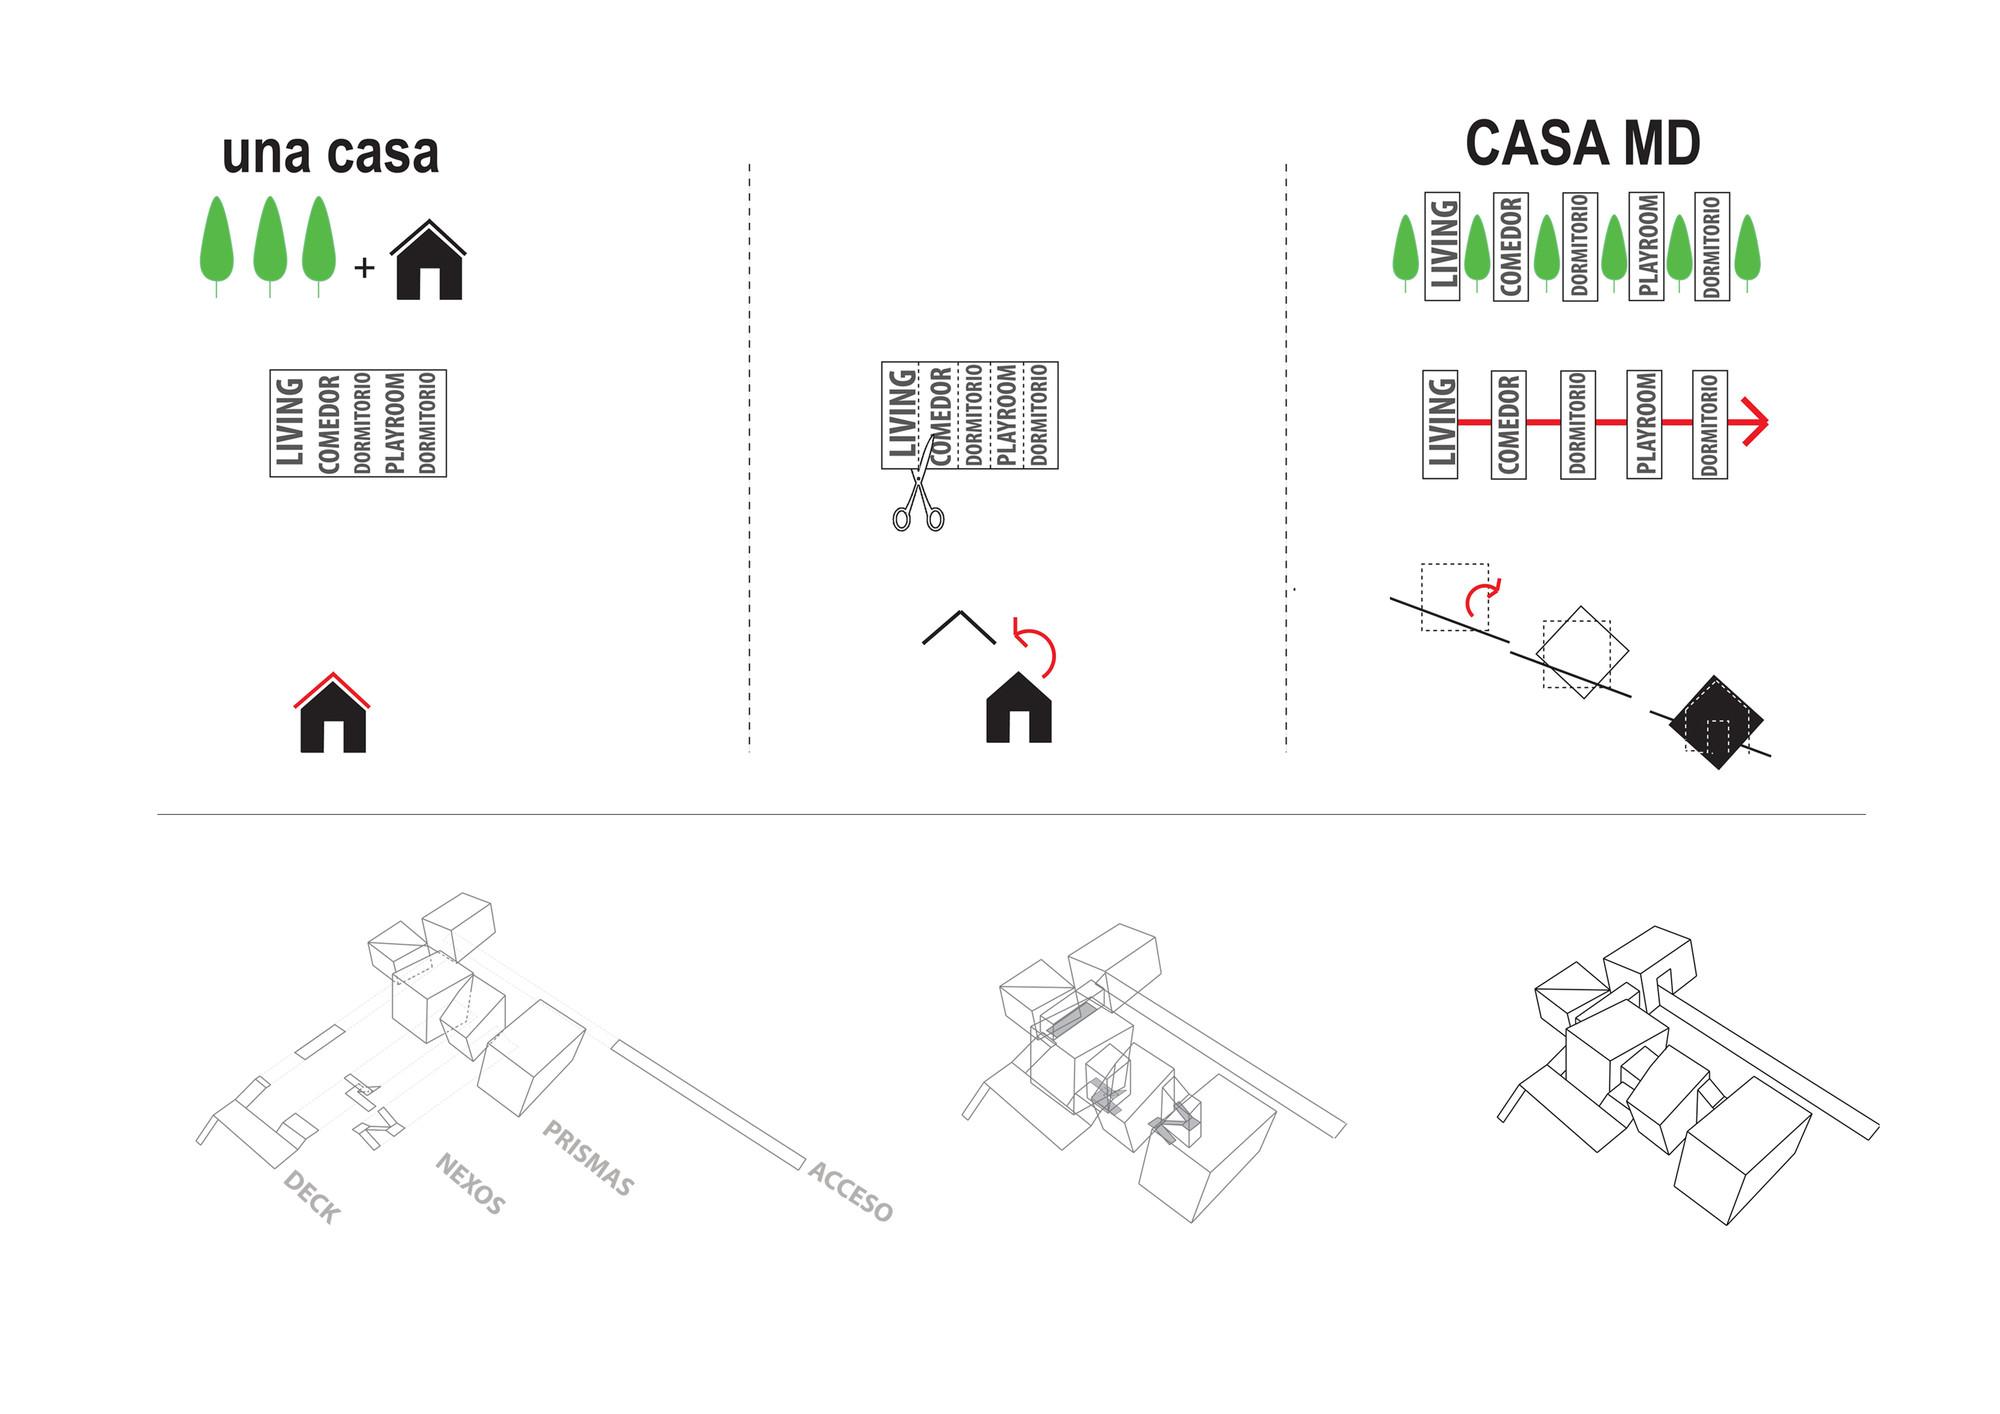 md house alric galindez arquitectos diagram [ 2000 x 1414 Pixel ]